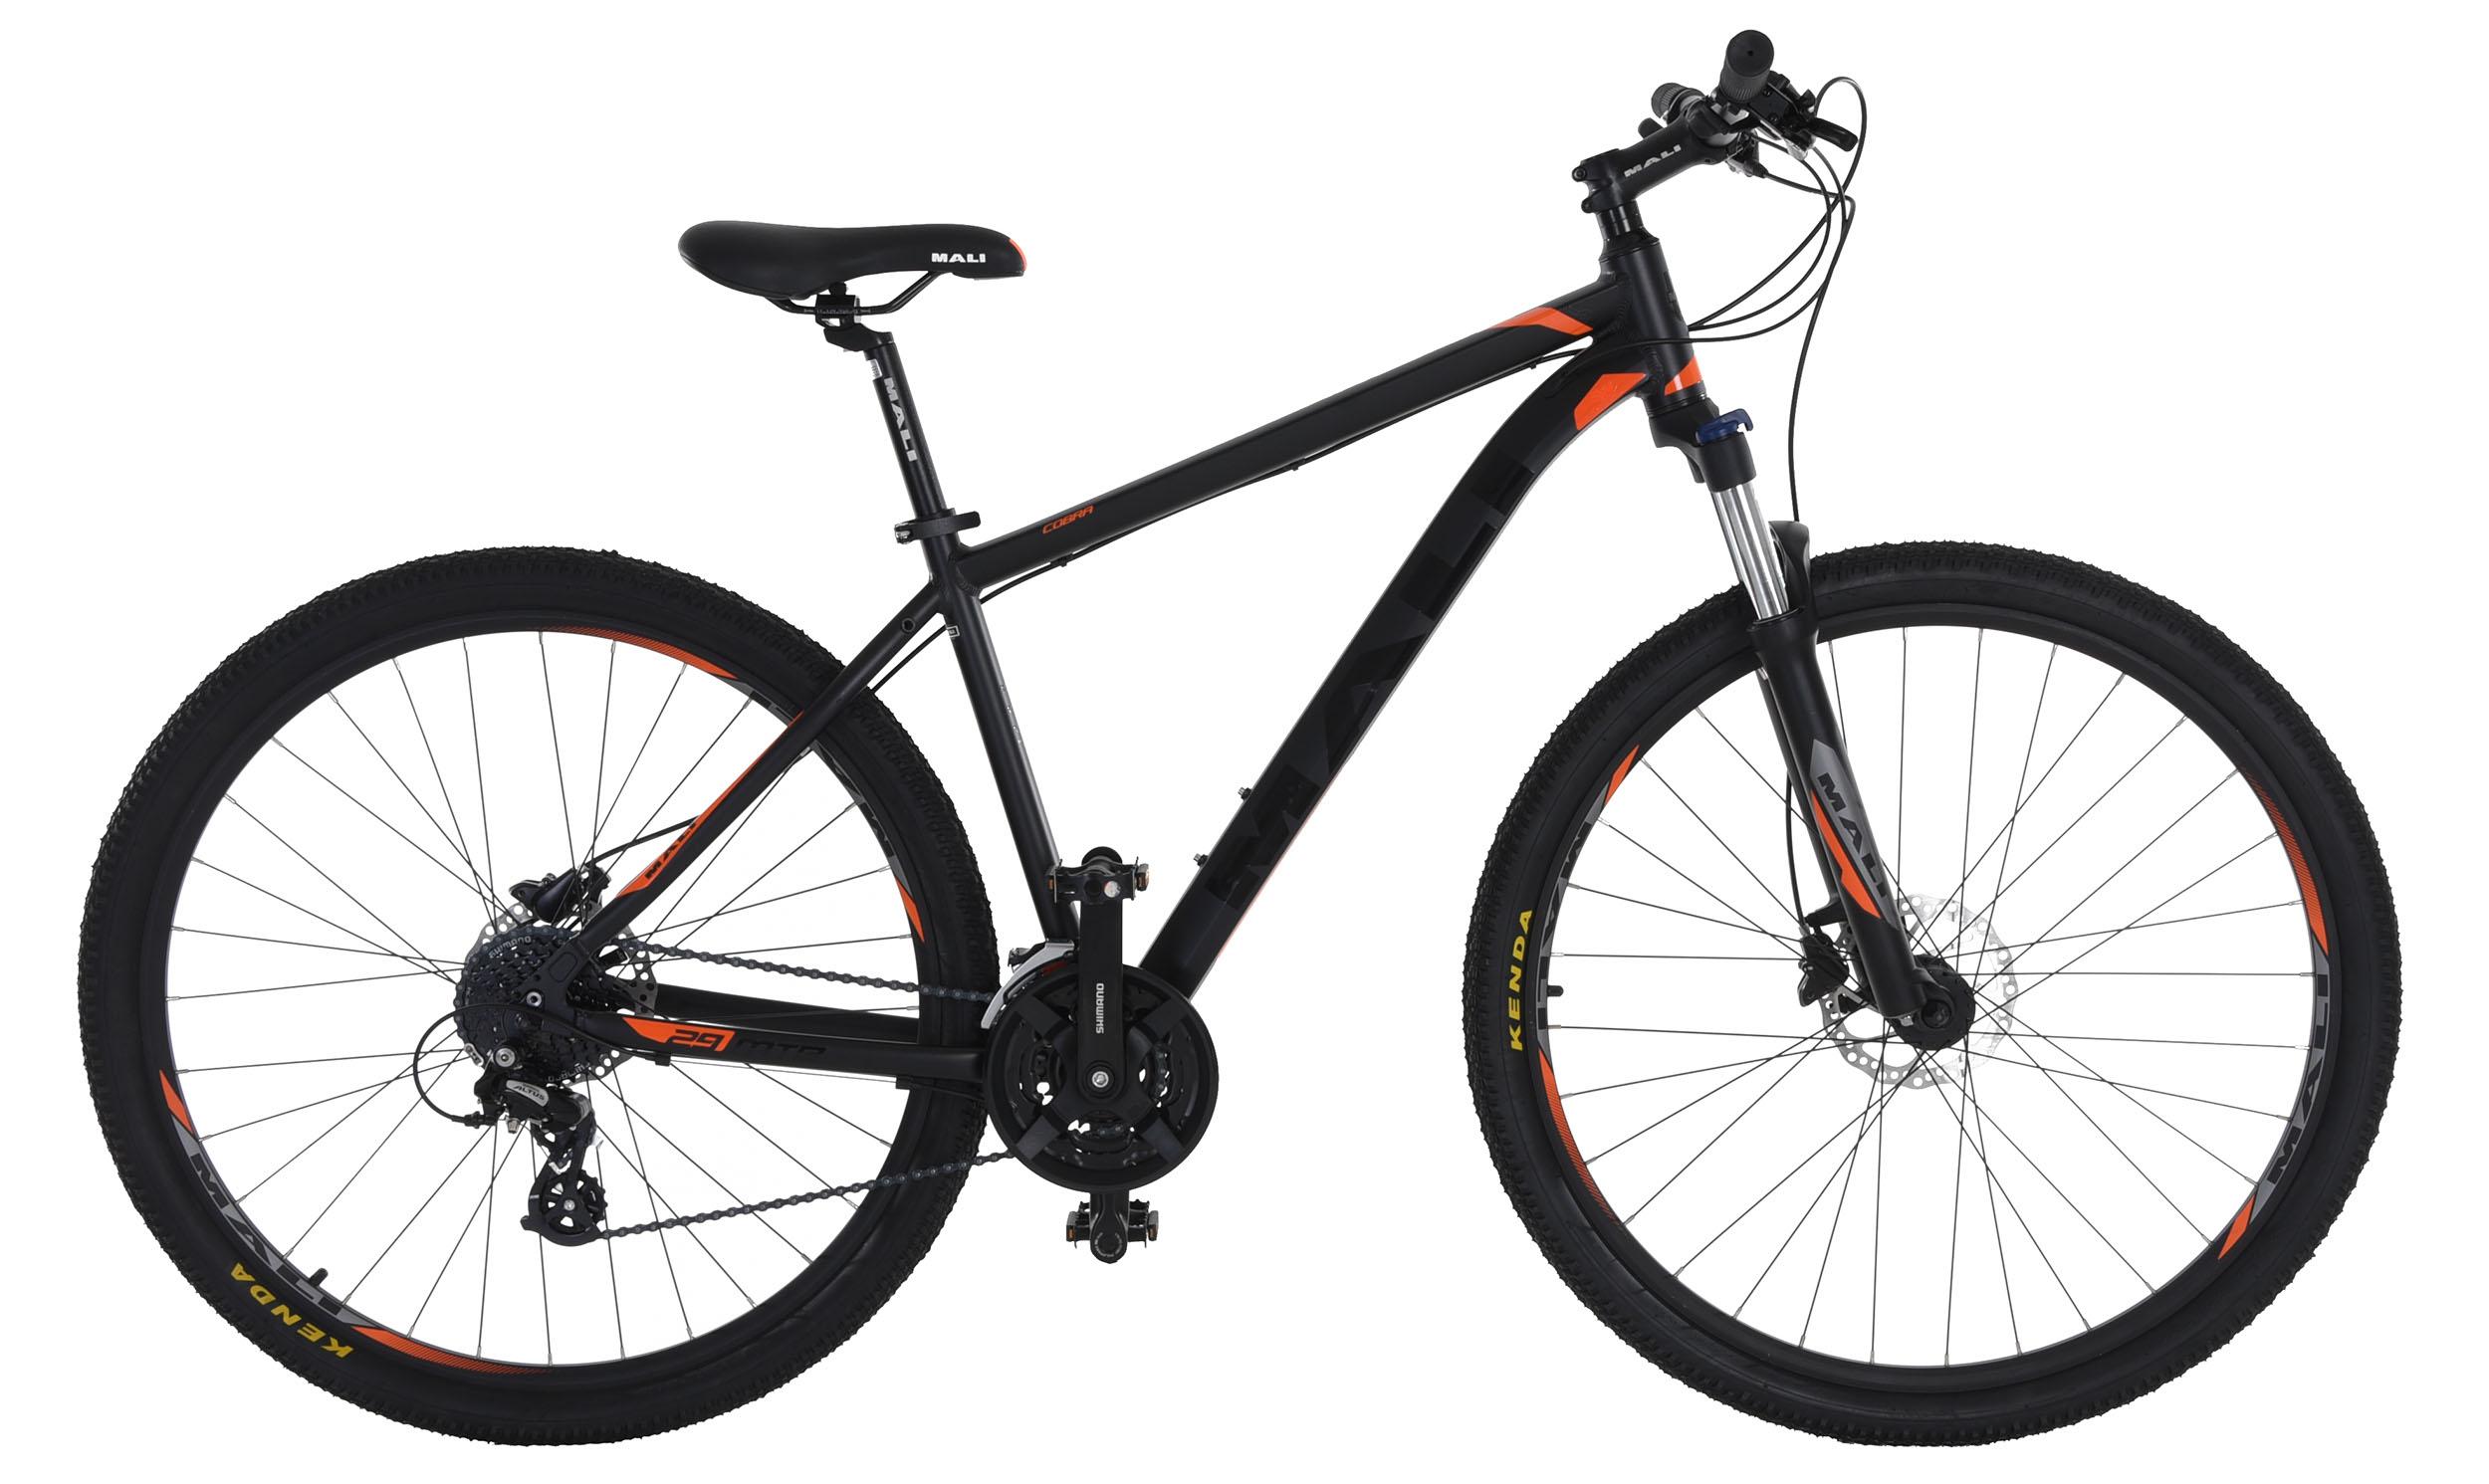 thumbnail 12 - COBRA 29er Mountain Bike 24 Speed MTB with 29-Inch Wheels